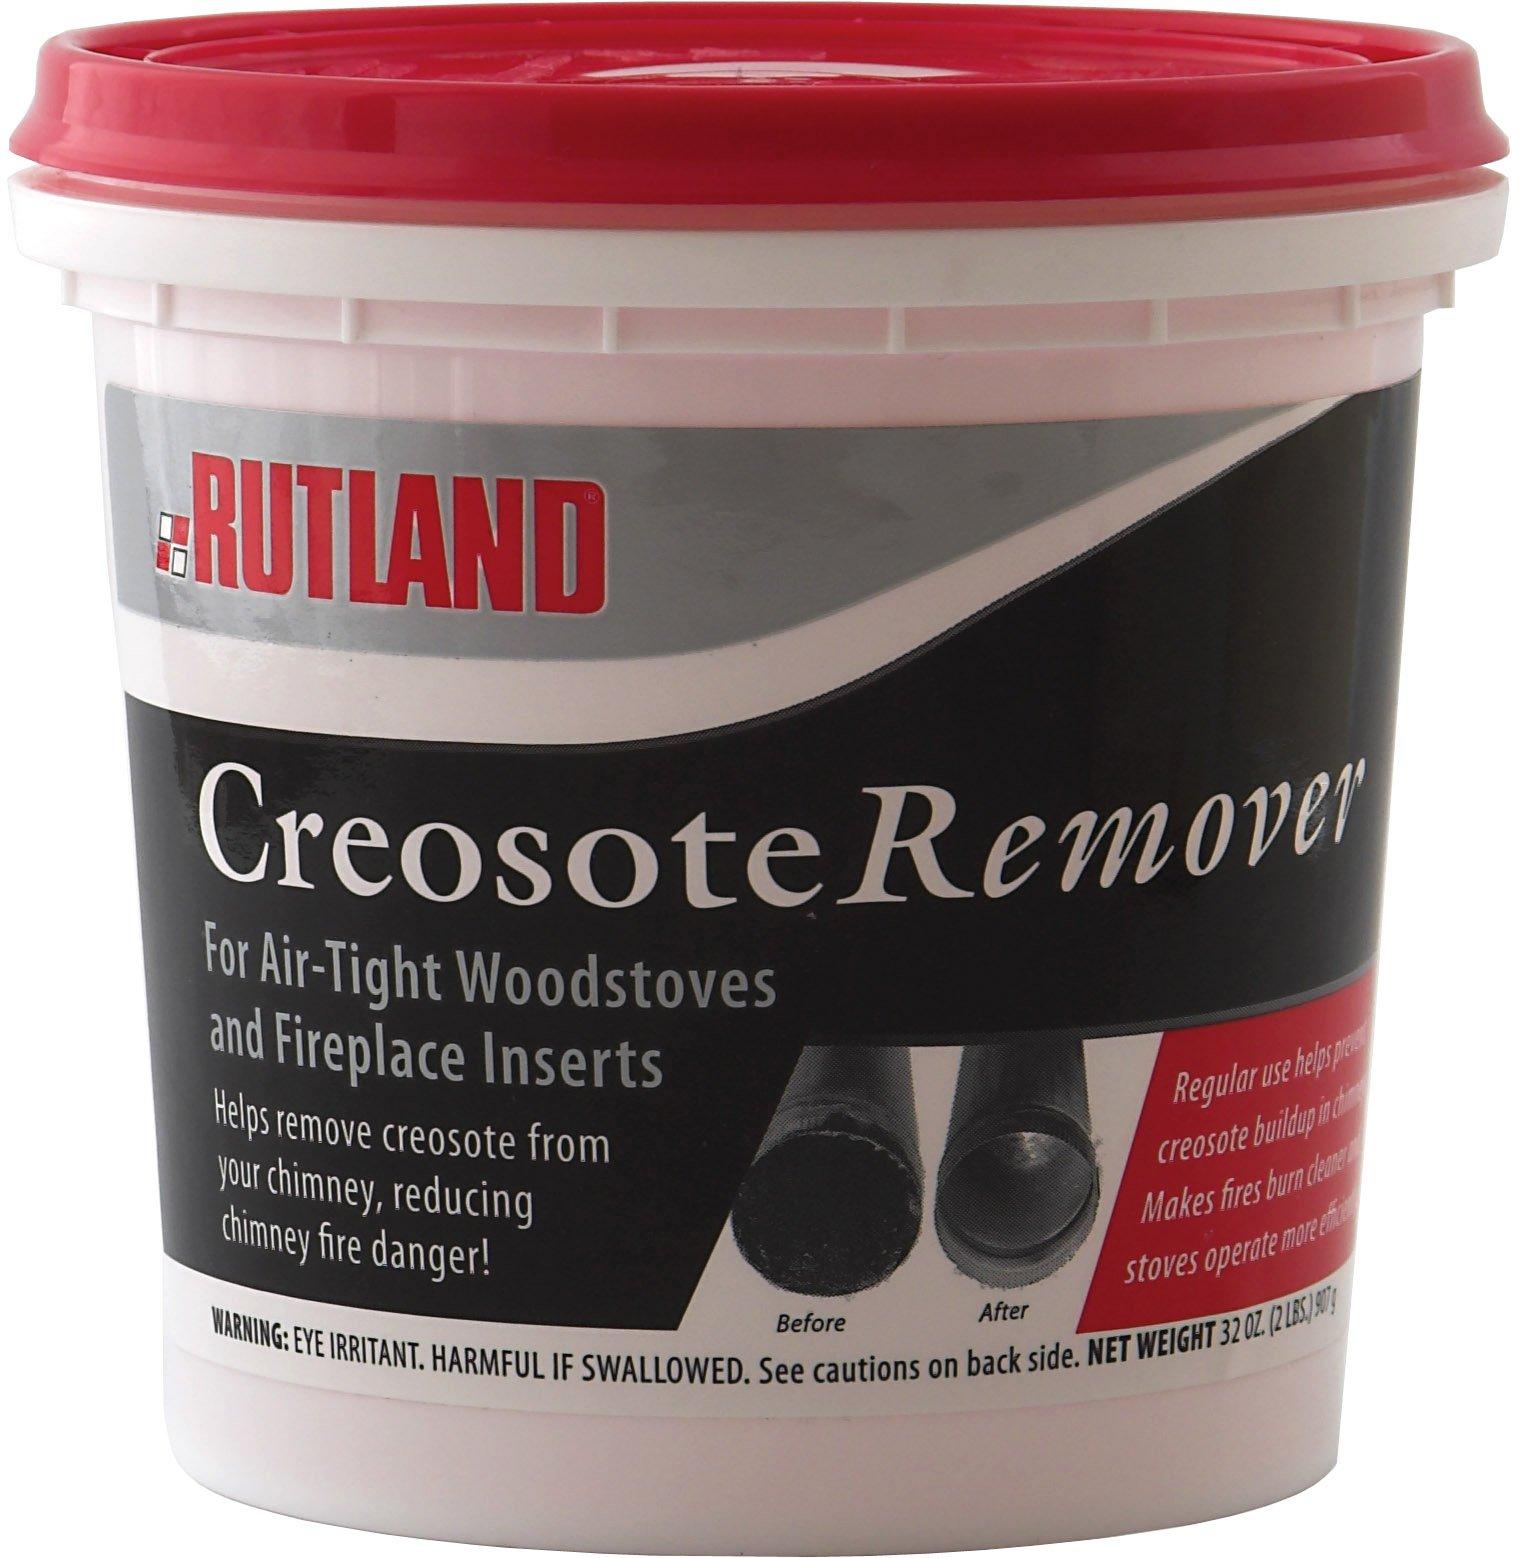 Rutland Dry Creosote Remover Chimney Treatment, 2-Pound